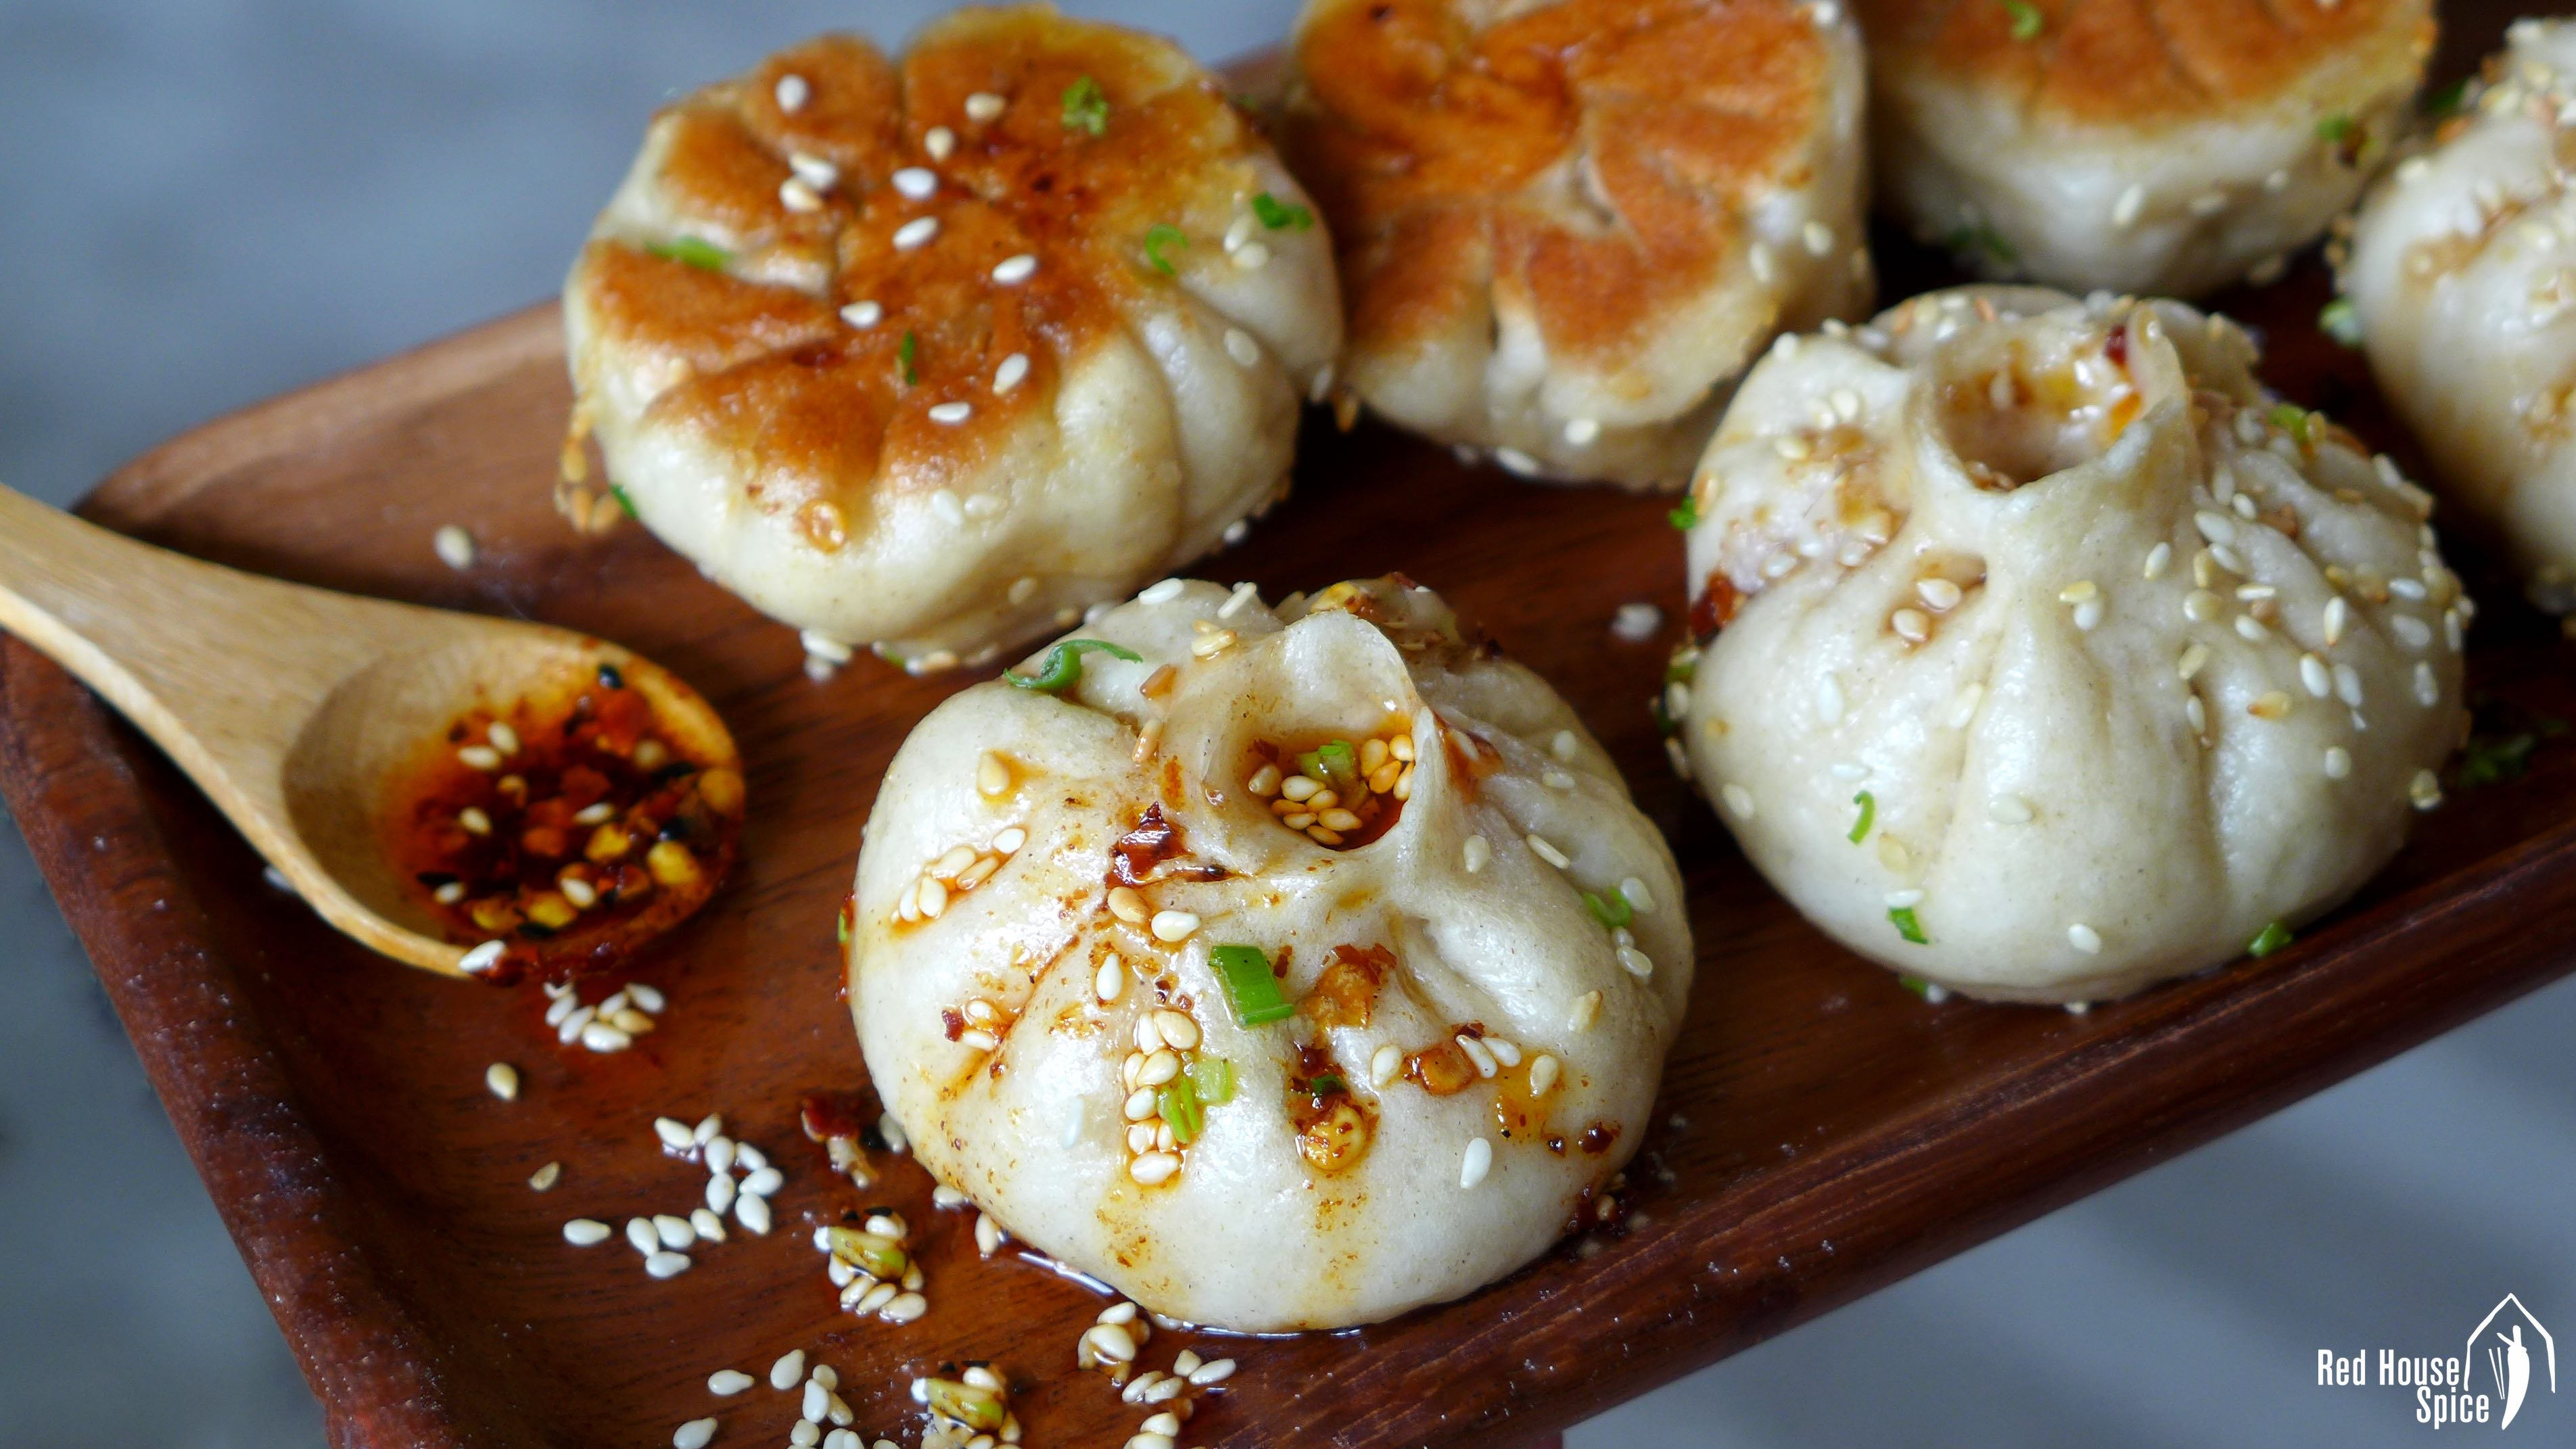 Sheng Jian Bao: Pan-fried pork buns (生煎包) – Red House Spice